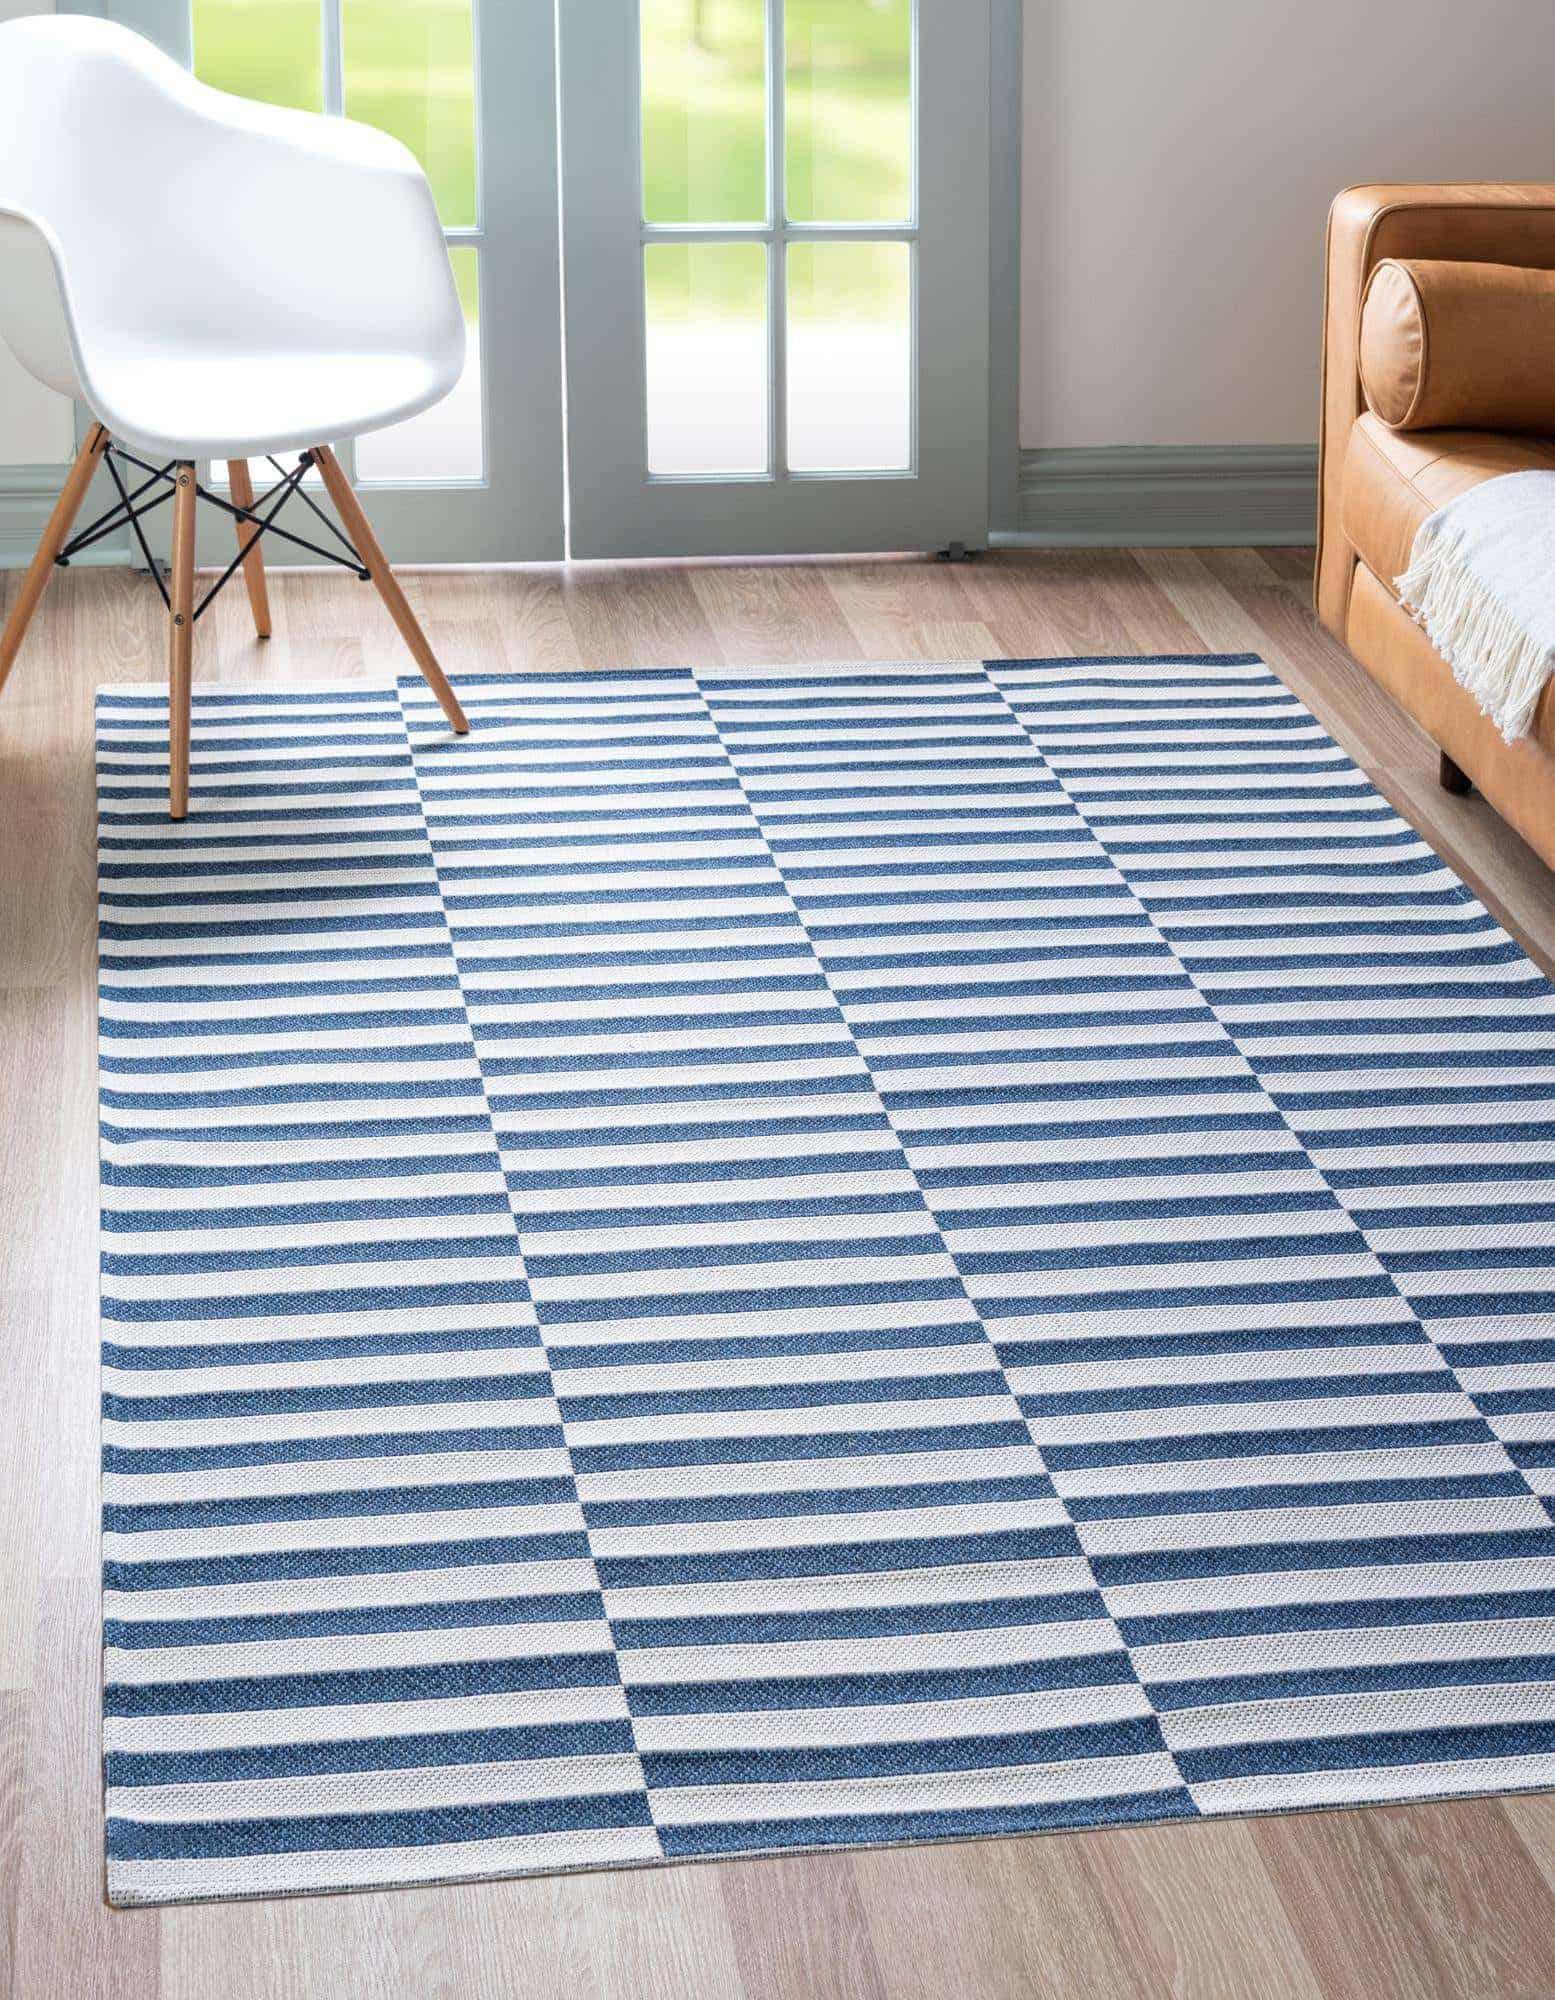 Navy Blue and White Geometric Rug